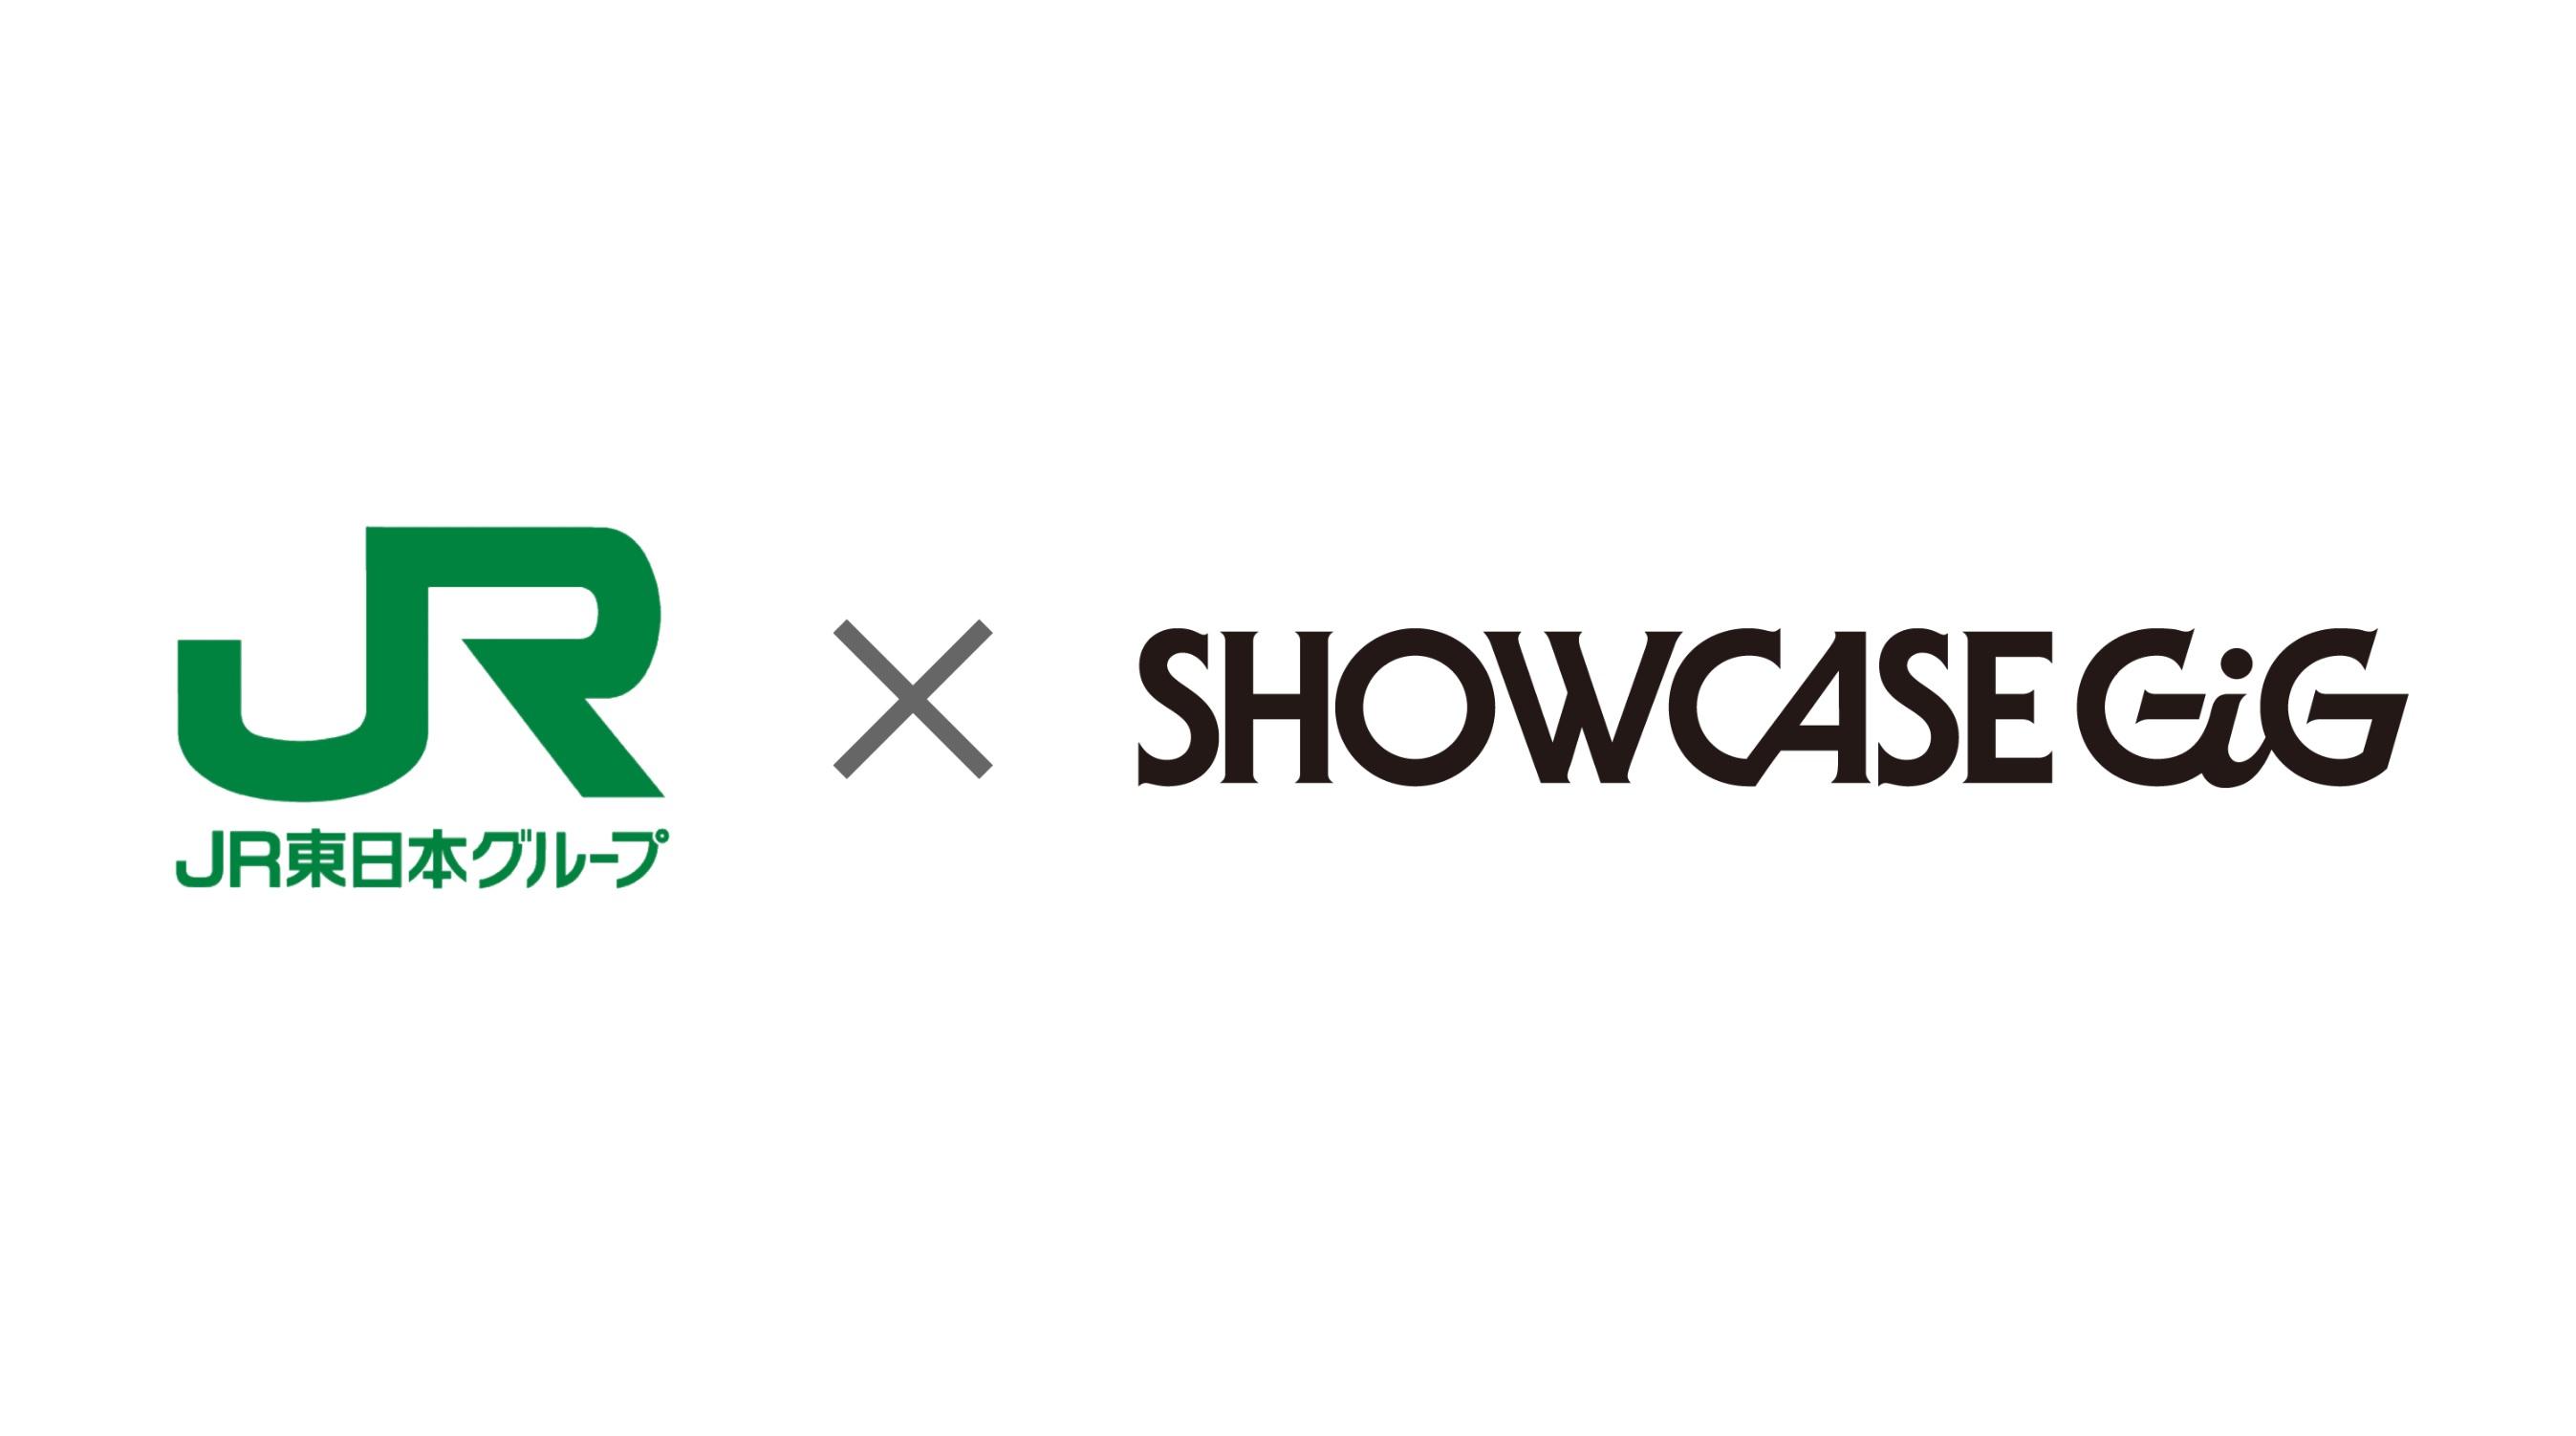 Showcase Gig×JR東日本、モバイルオーダー始まりました!